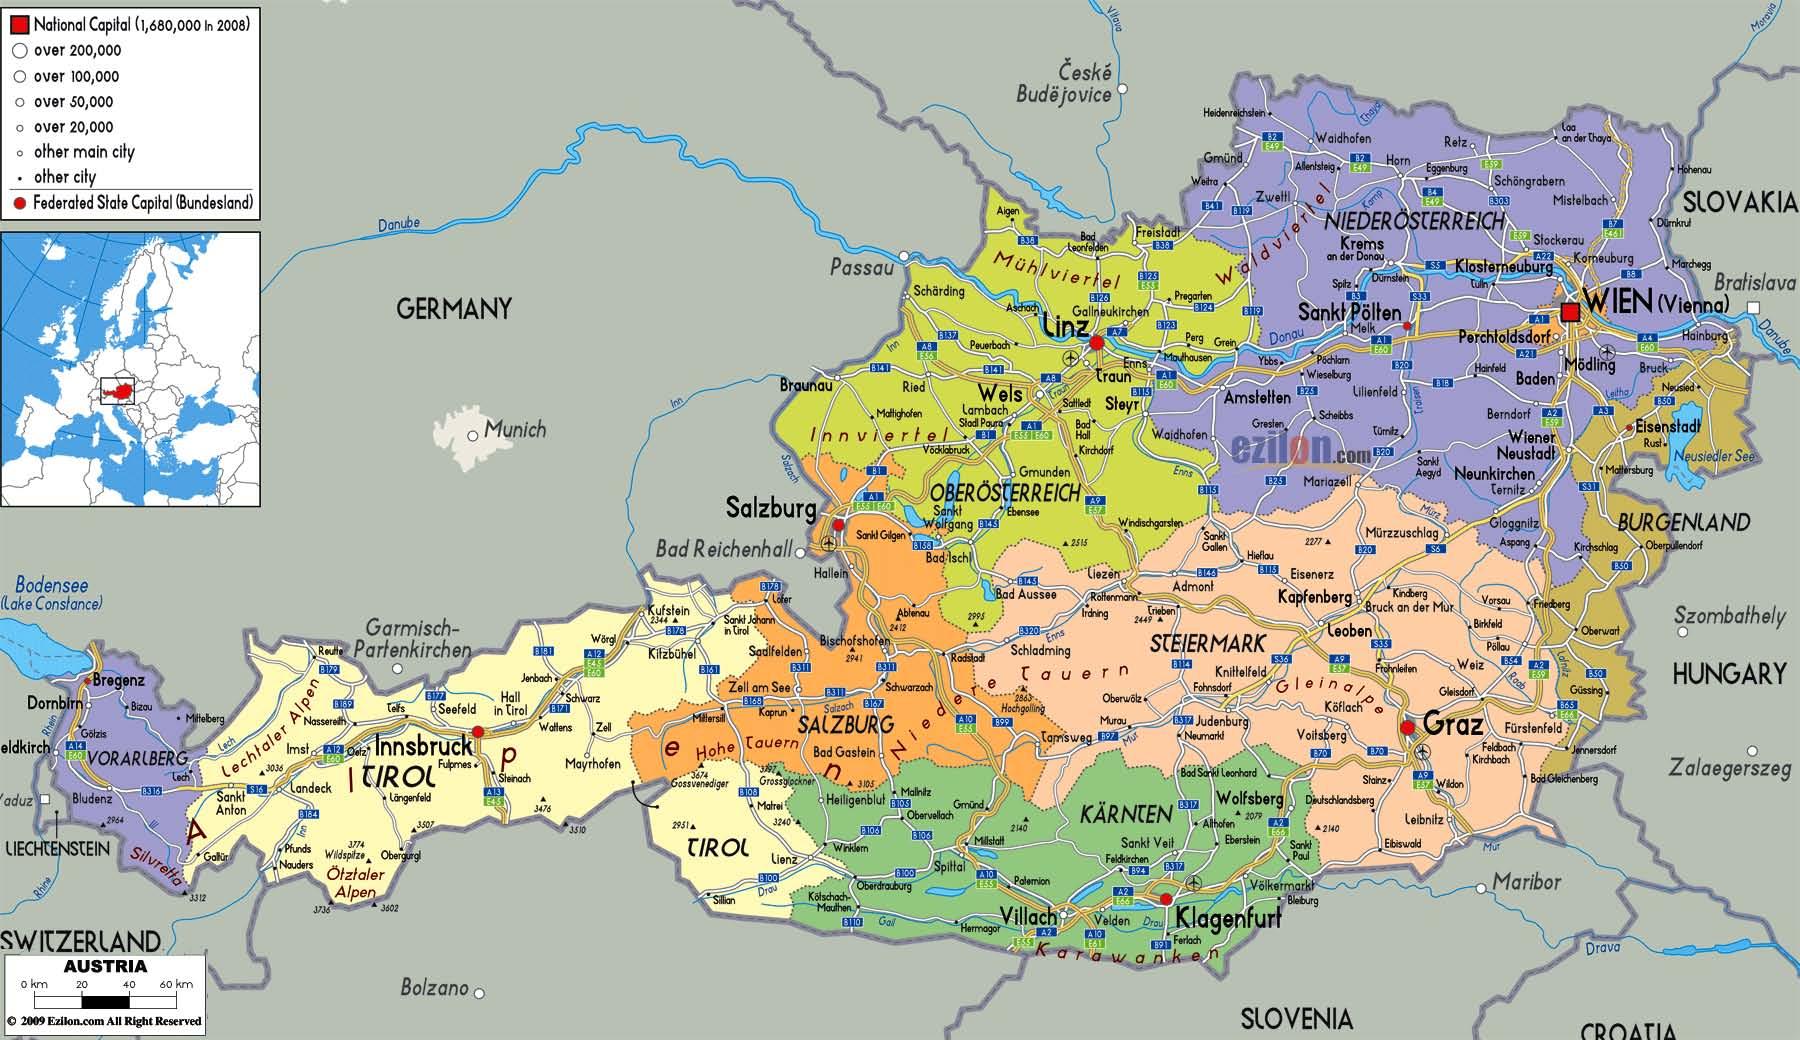 tirol ausztria térkép .geoturizmuscentrum.hu tirol ausztria térkép